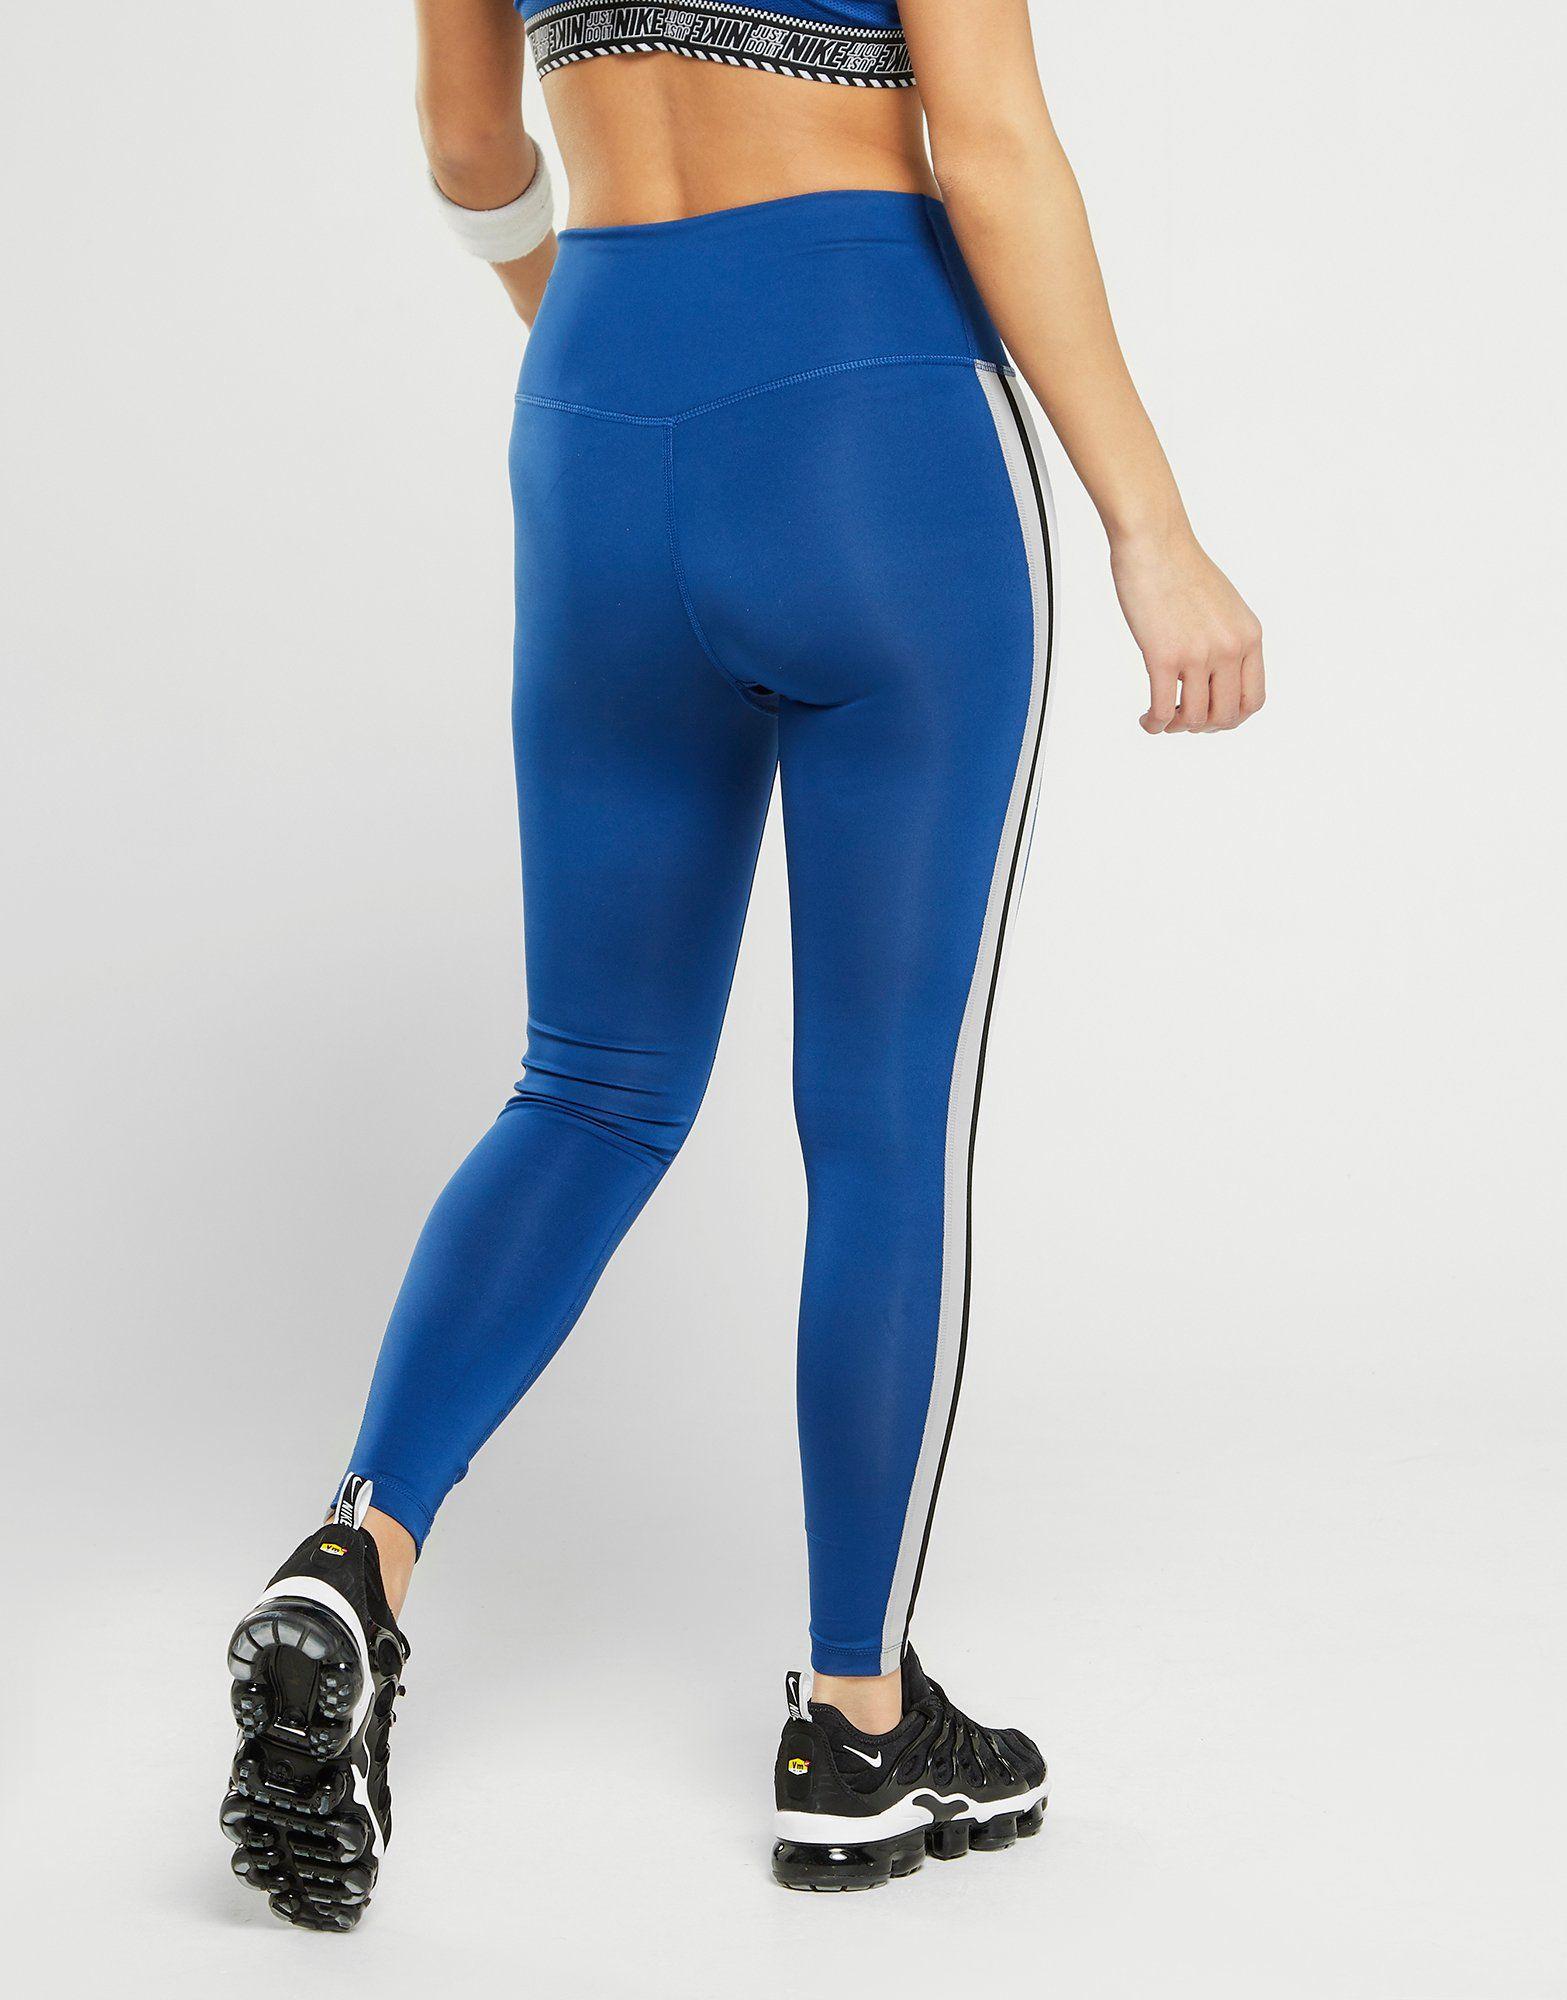 Nike Training Gym Tights